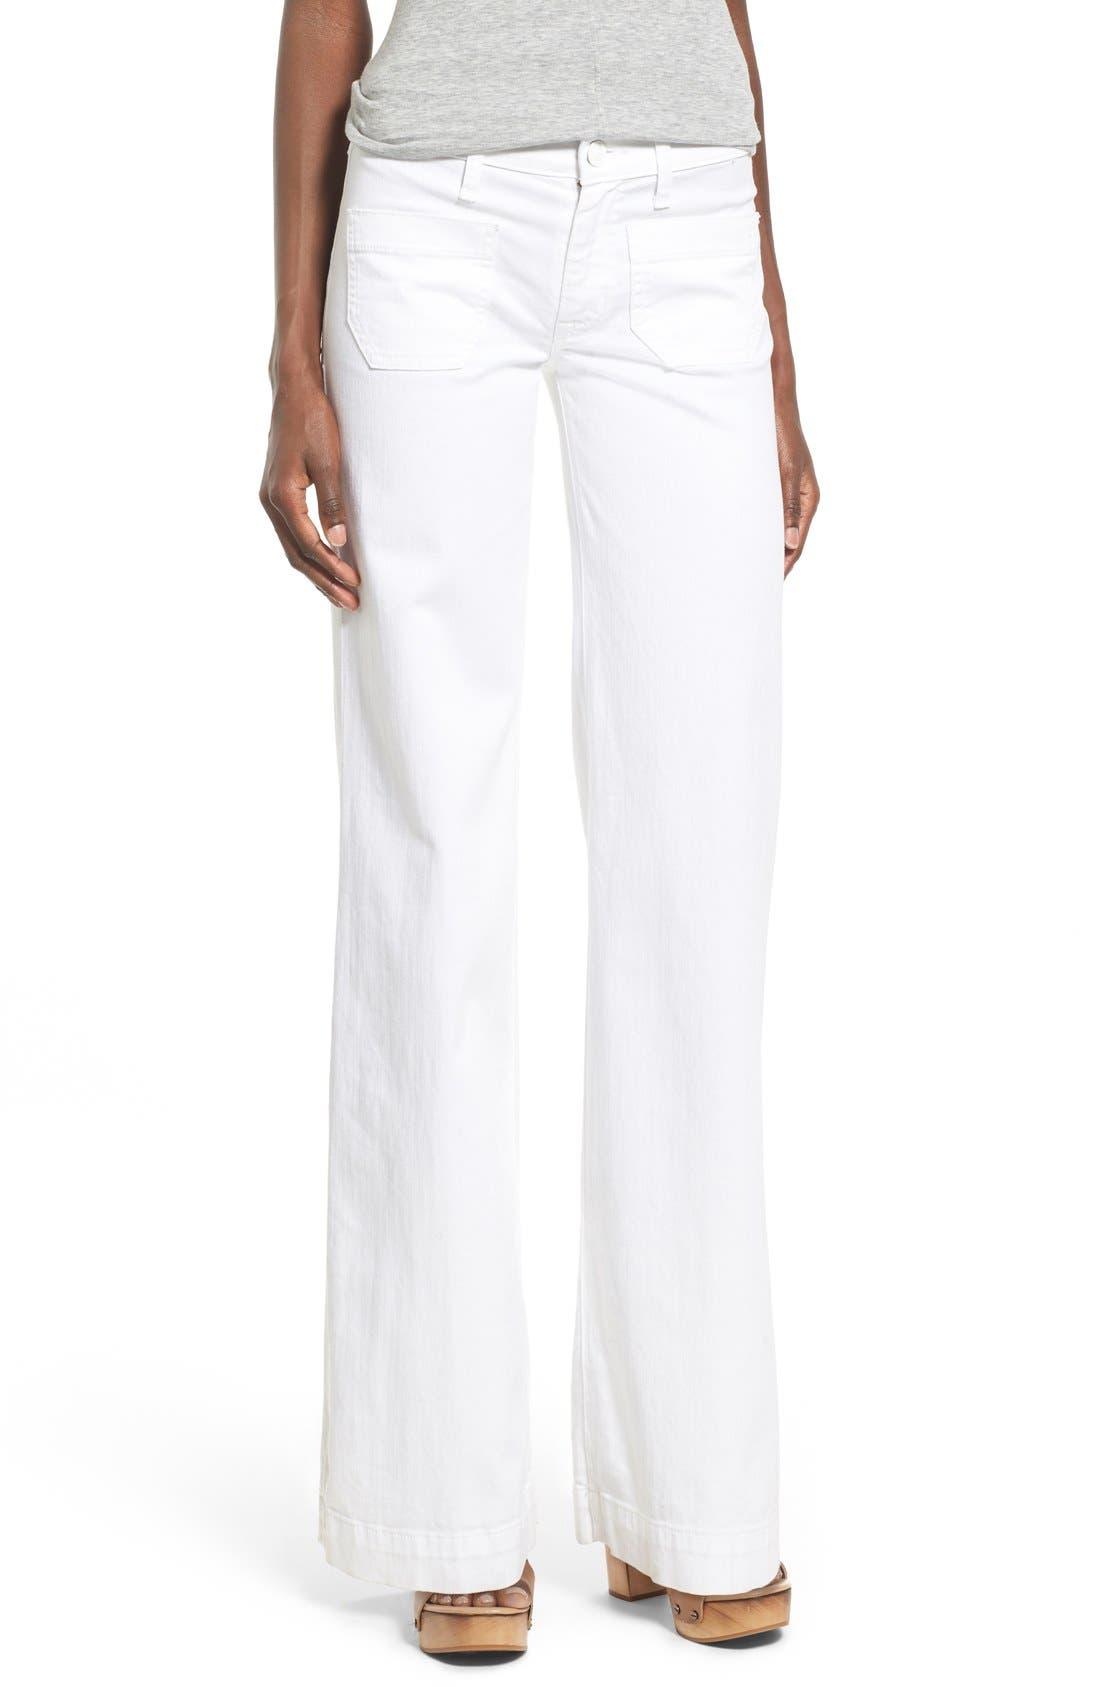 Alternate Image 1 Selected - Hudson Jeans 'Libby' Wide Leg Sailor Jeans (White 2)